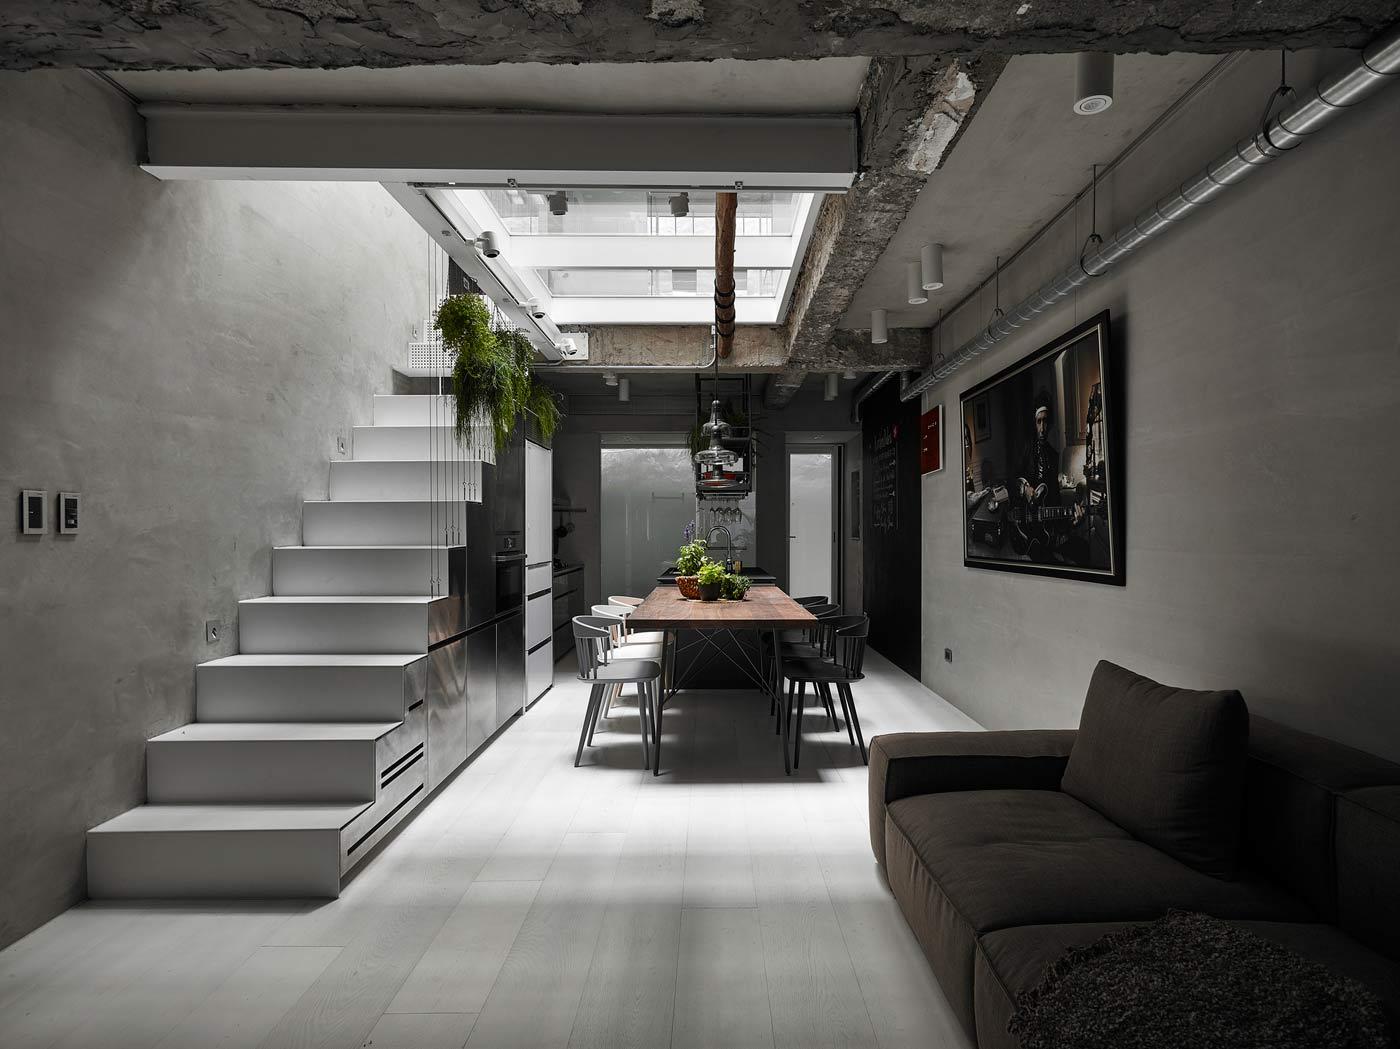 House W Is A Visionary Rebuild Of A Narrow Urban House Opumo Magazine